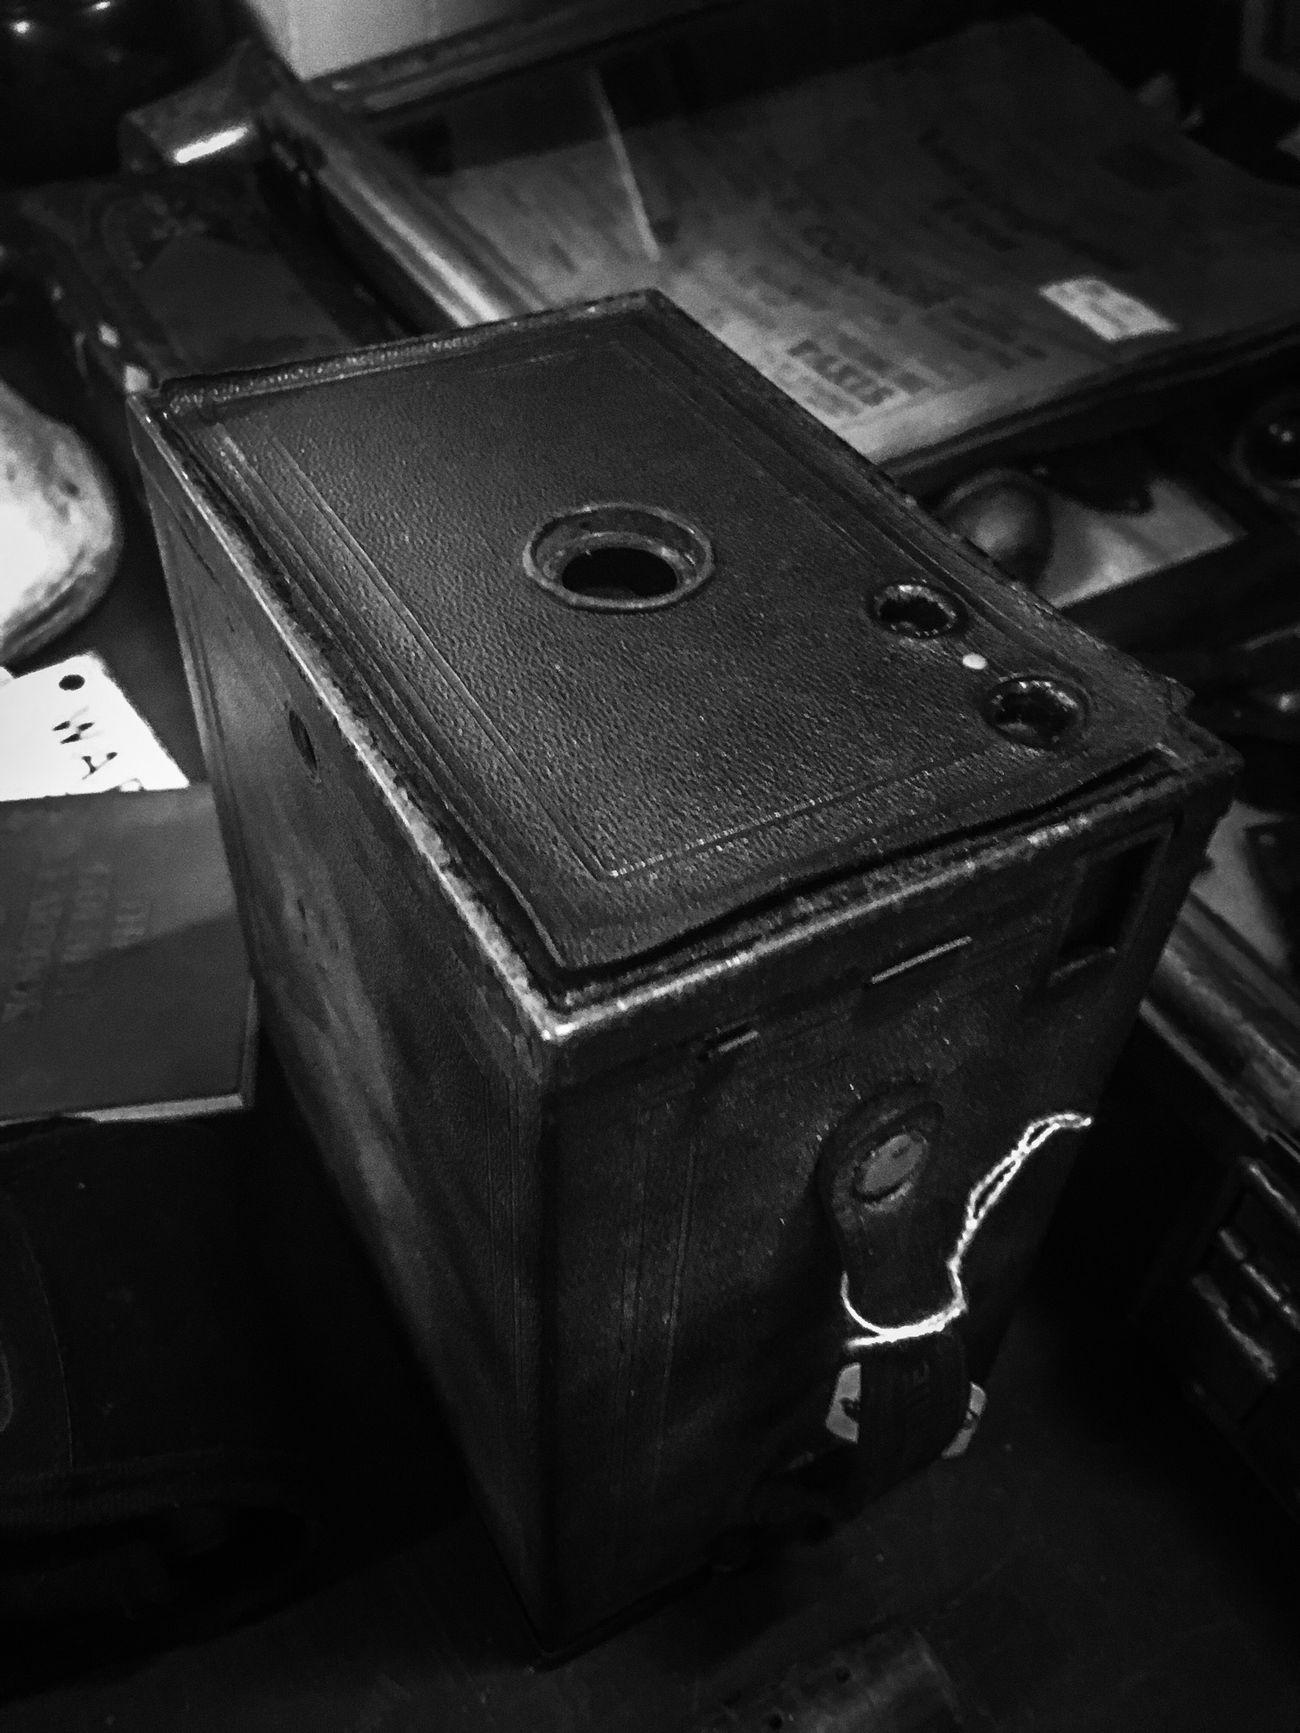 Kodak Kodak Brownie Vintage Original Antique Classic Medium Format Film Filmcamera 117 1900s 1900 1st Generation Mk1